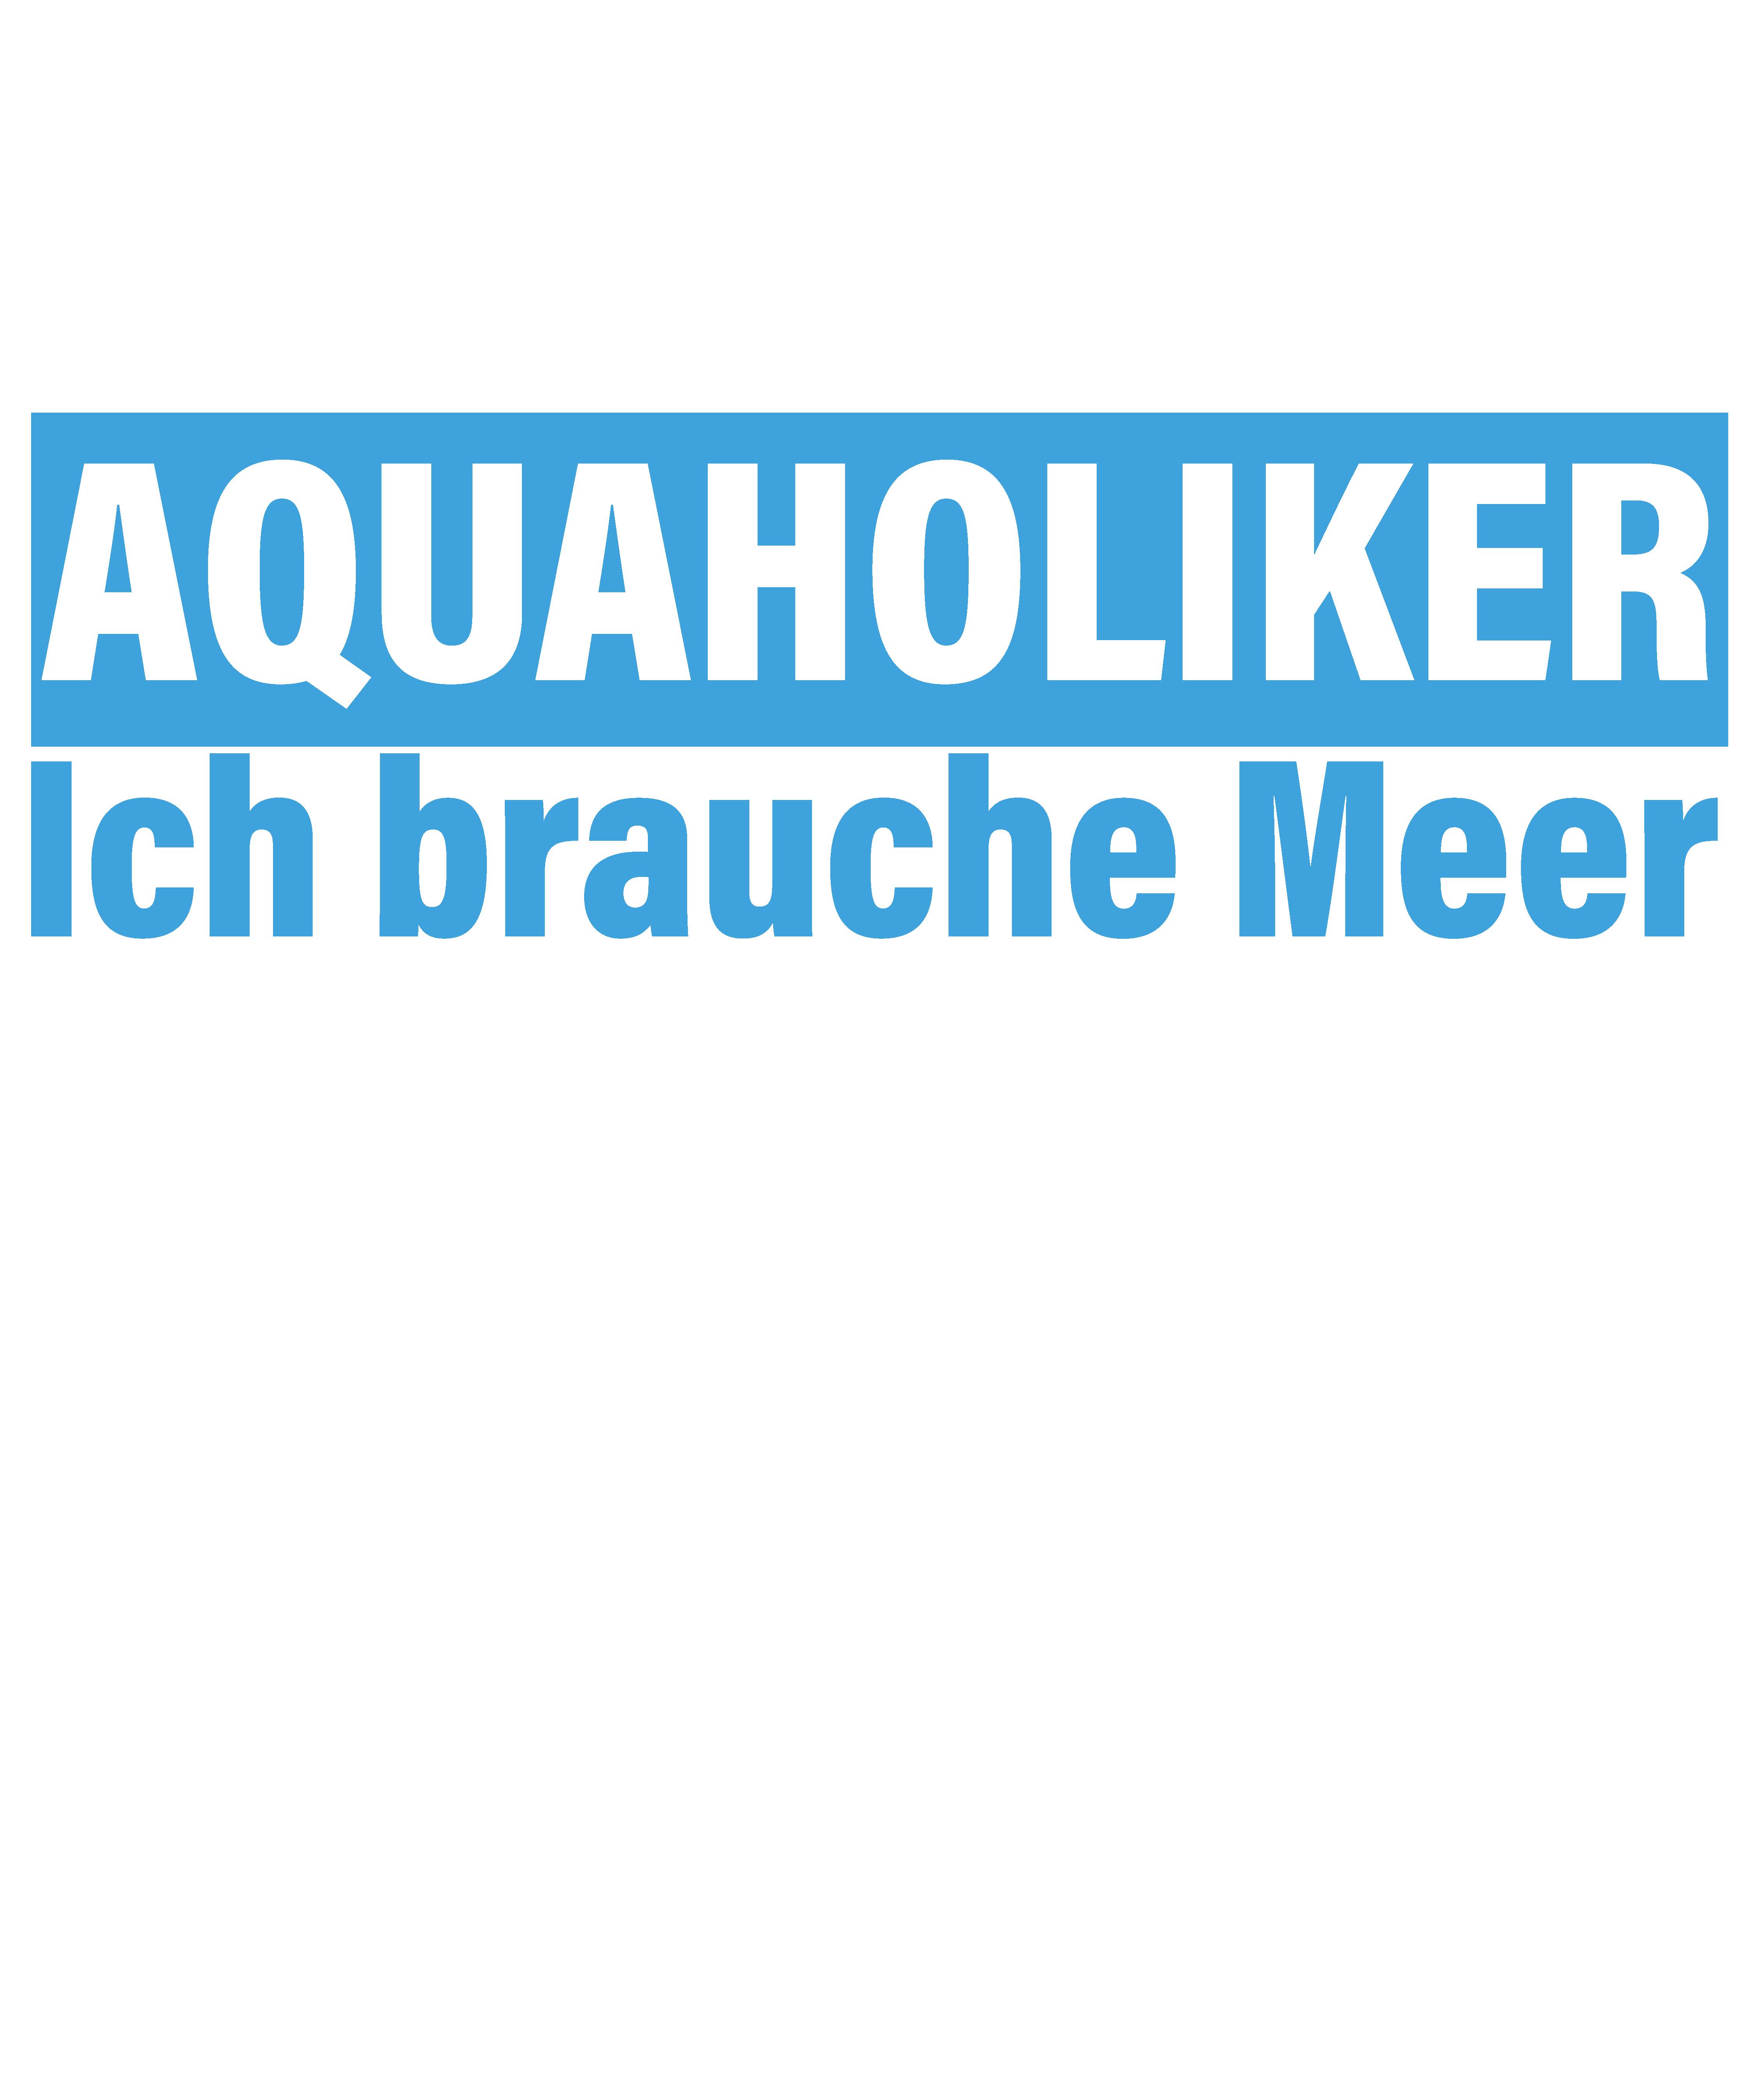 Aquaholiker post thumbnail image